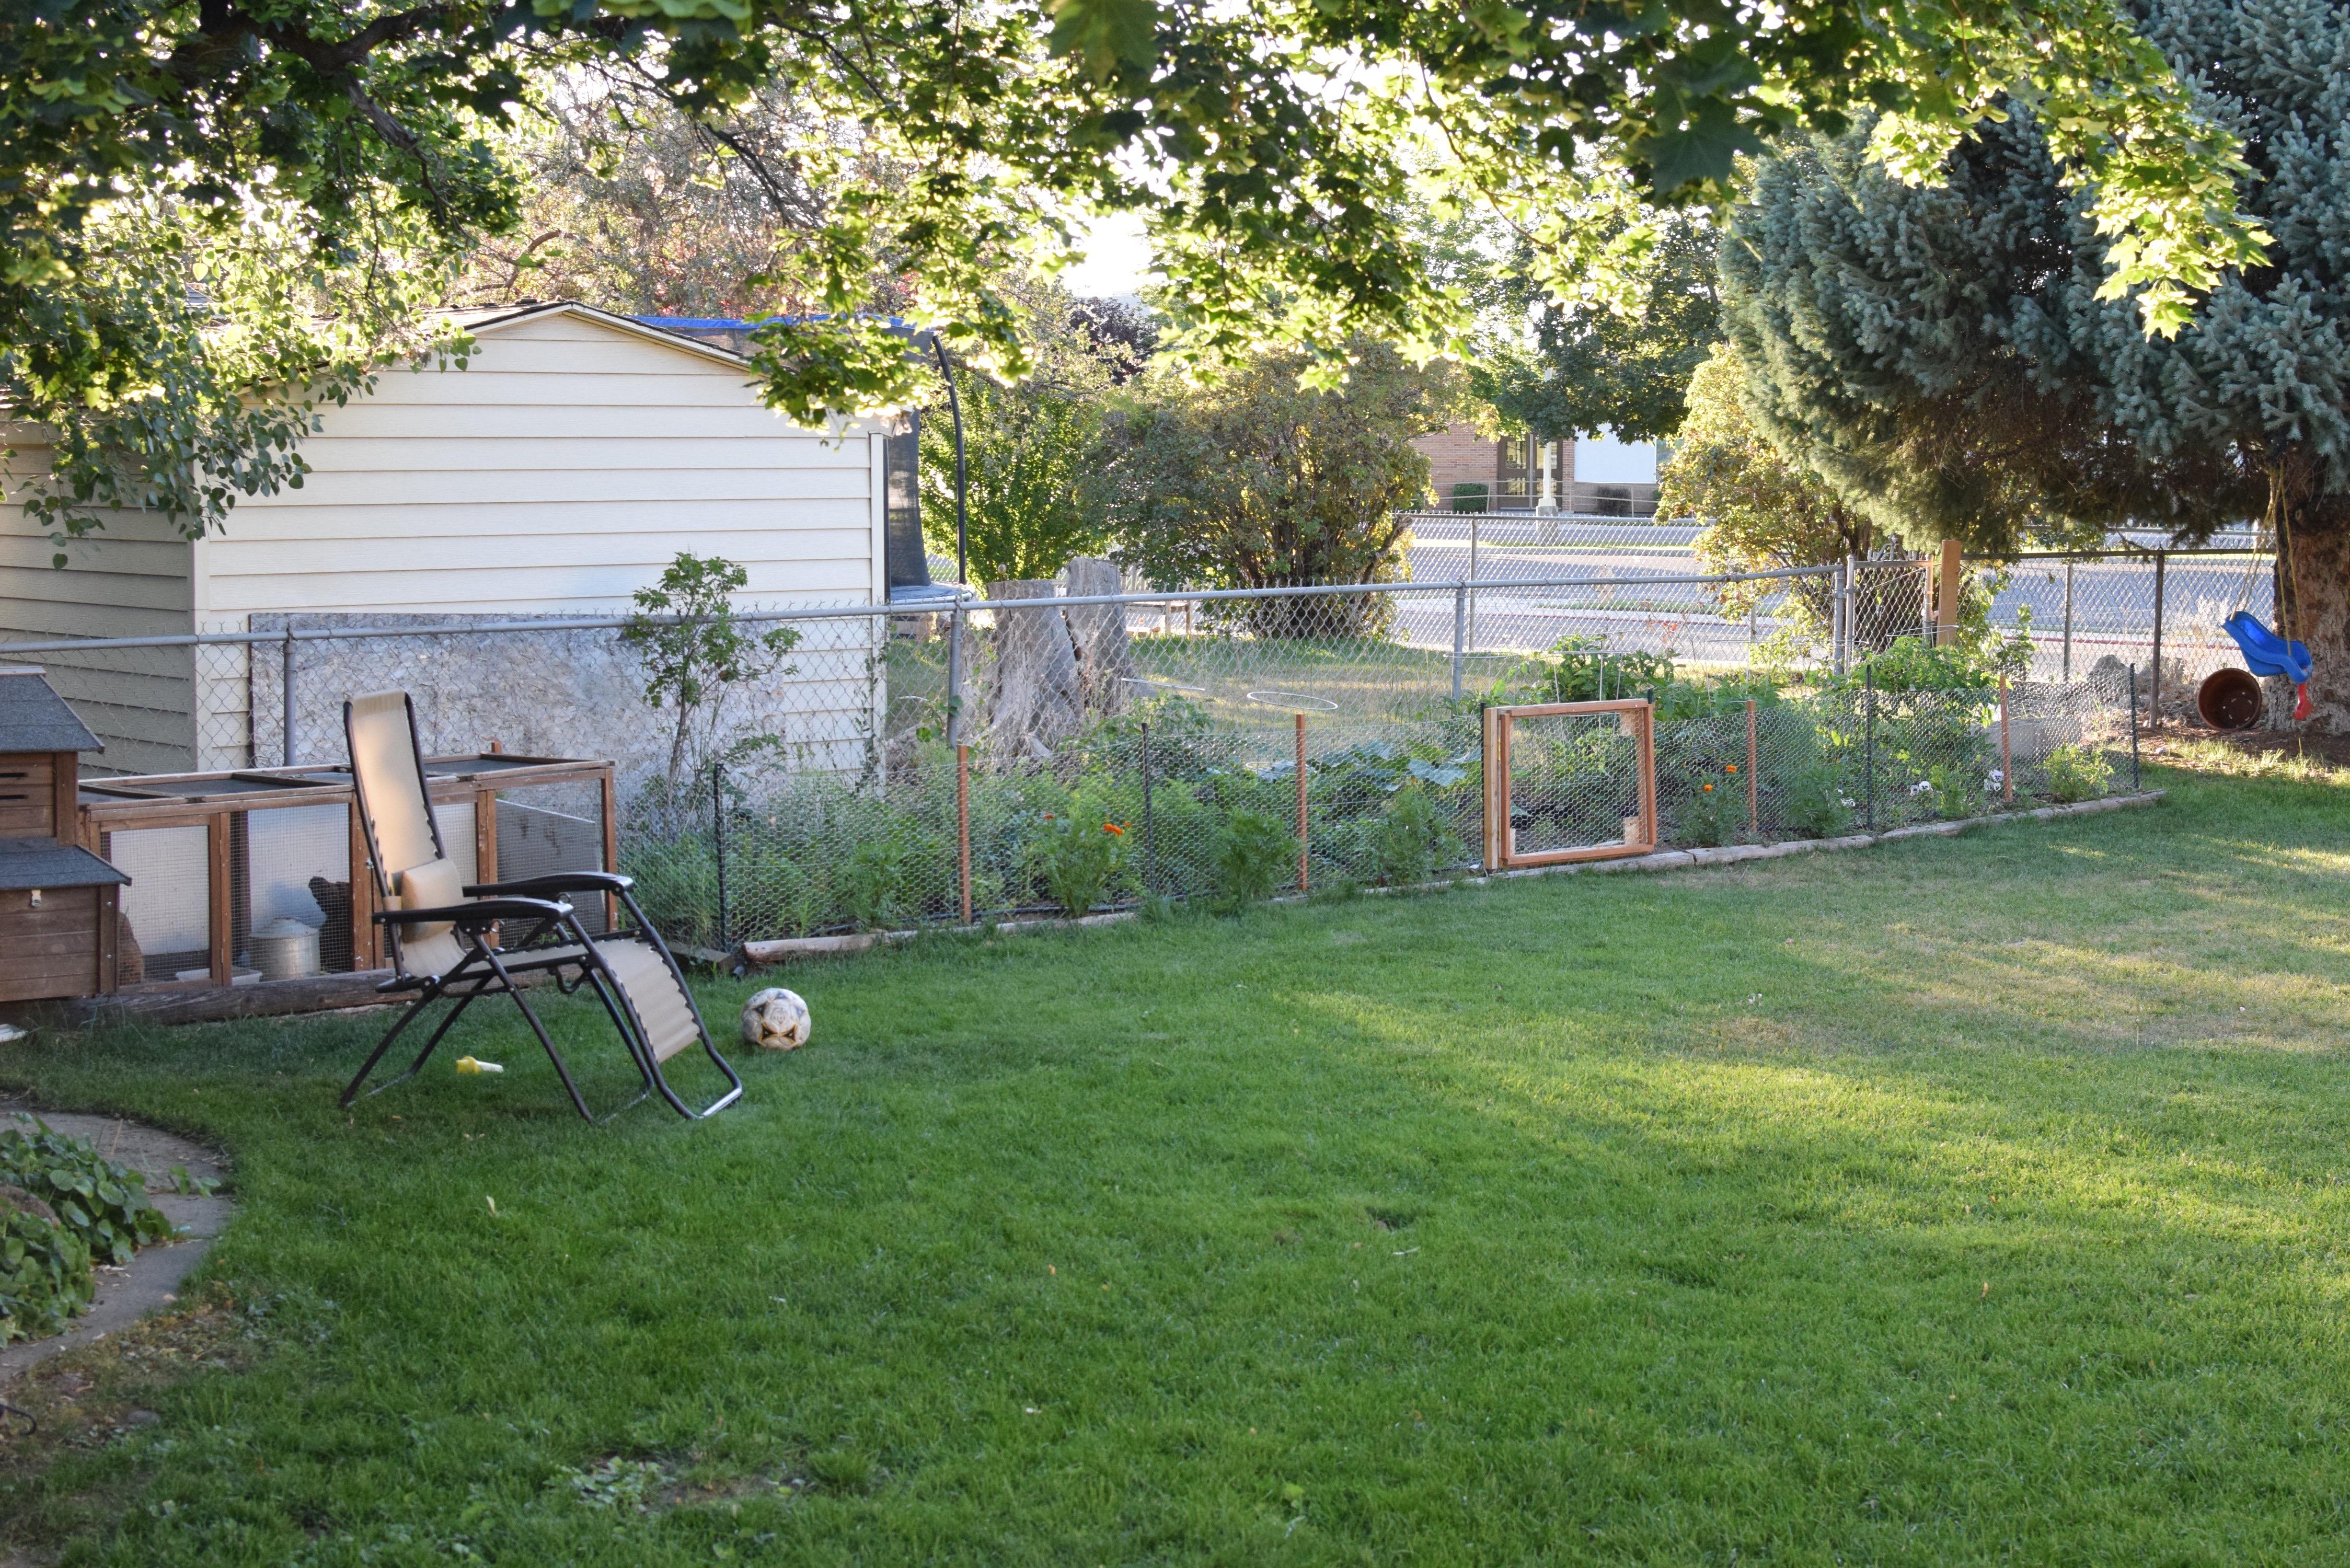 how to close off a garden